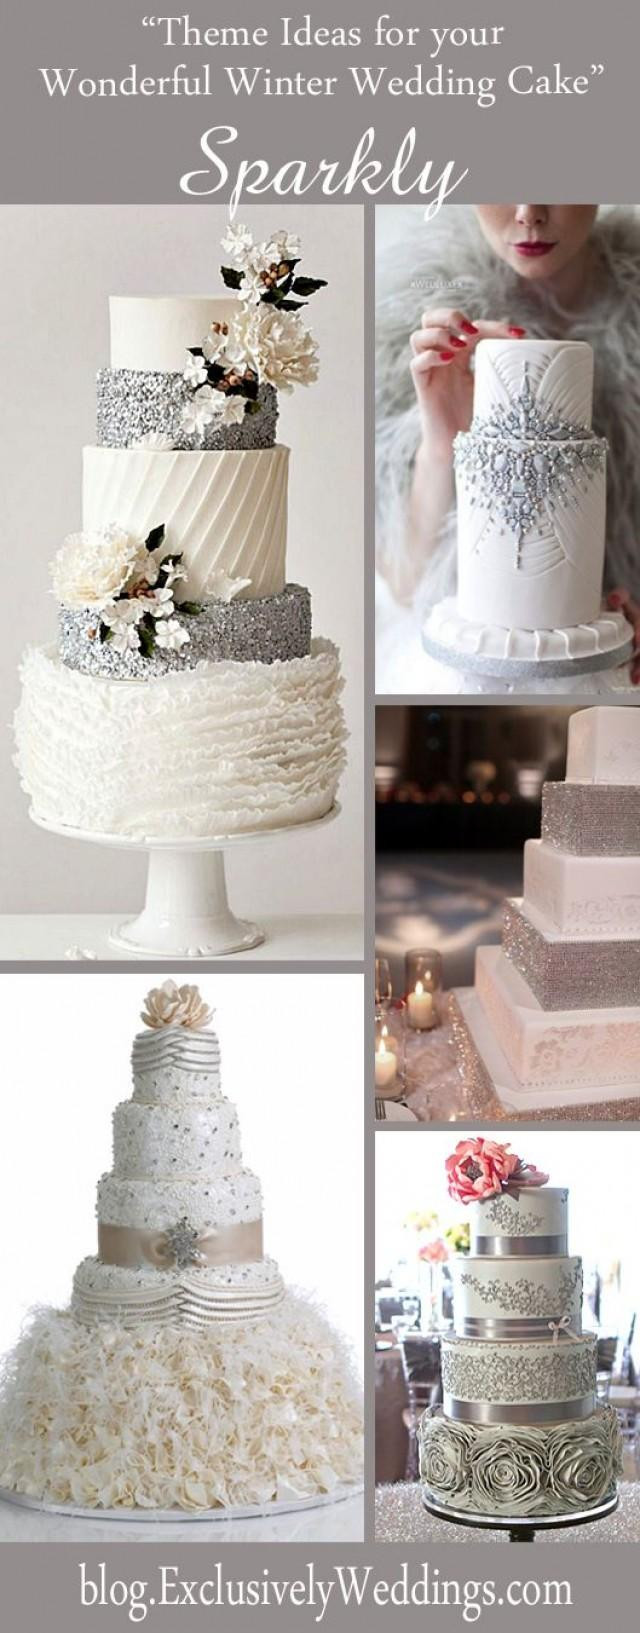 Wonderful Wedding Cakes  Five Theme Ideas For Your Wonderful Winter Wedding Cake